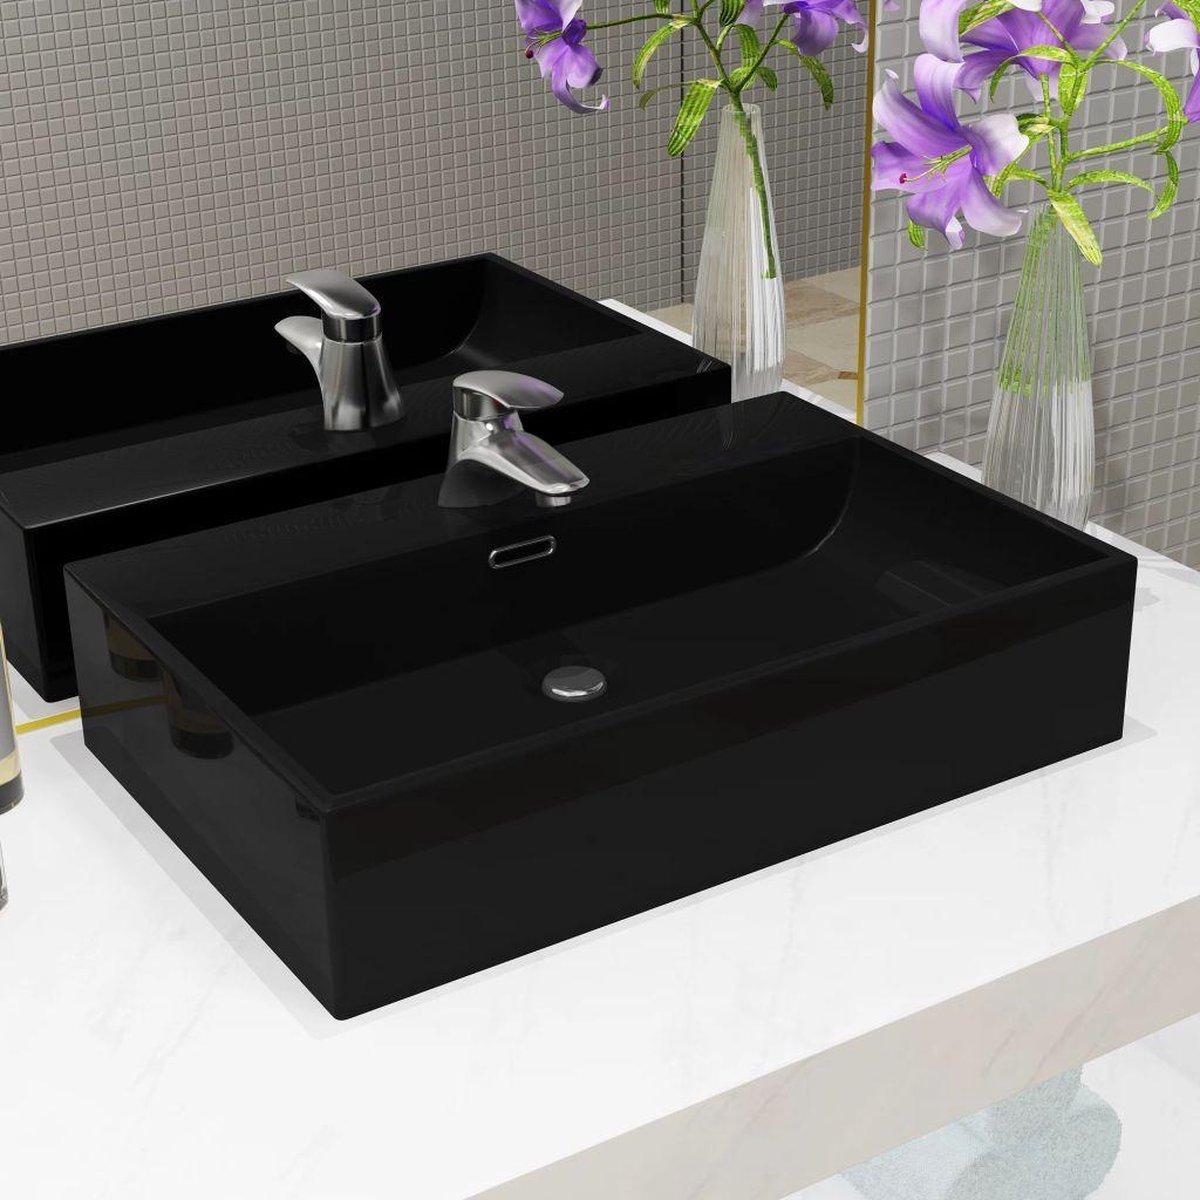 vidaXL Wastafel met kraangat 60.5x42.5x14.5 cm keramiek zwart